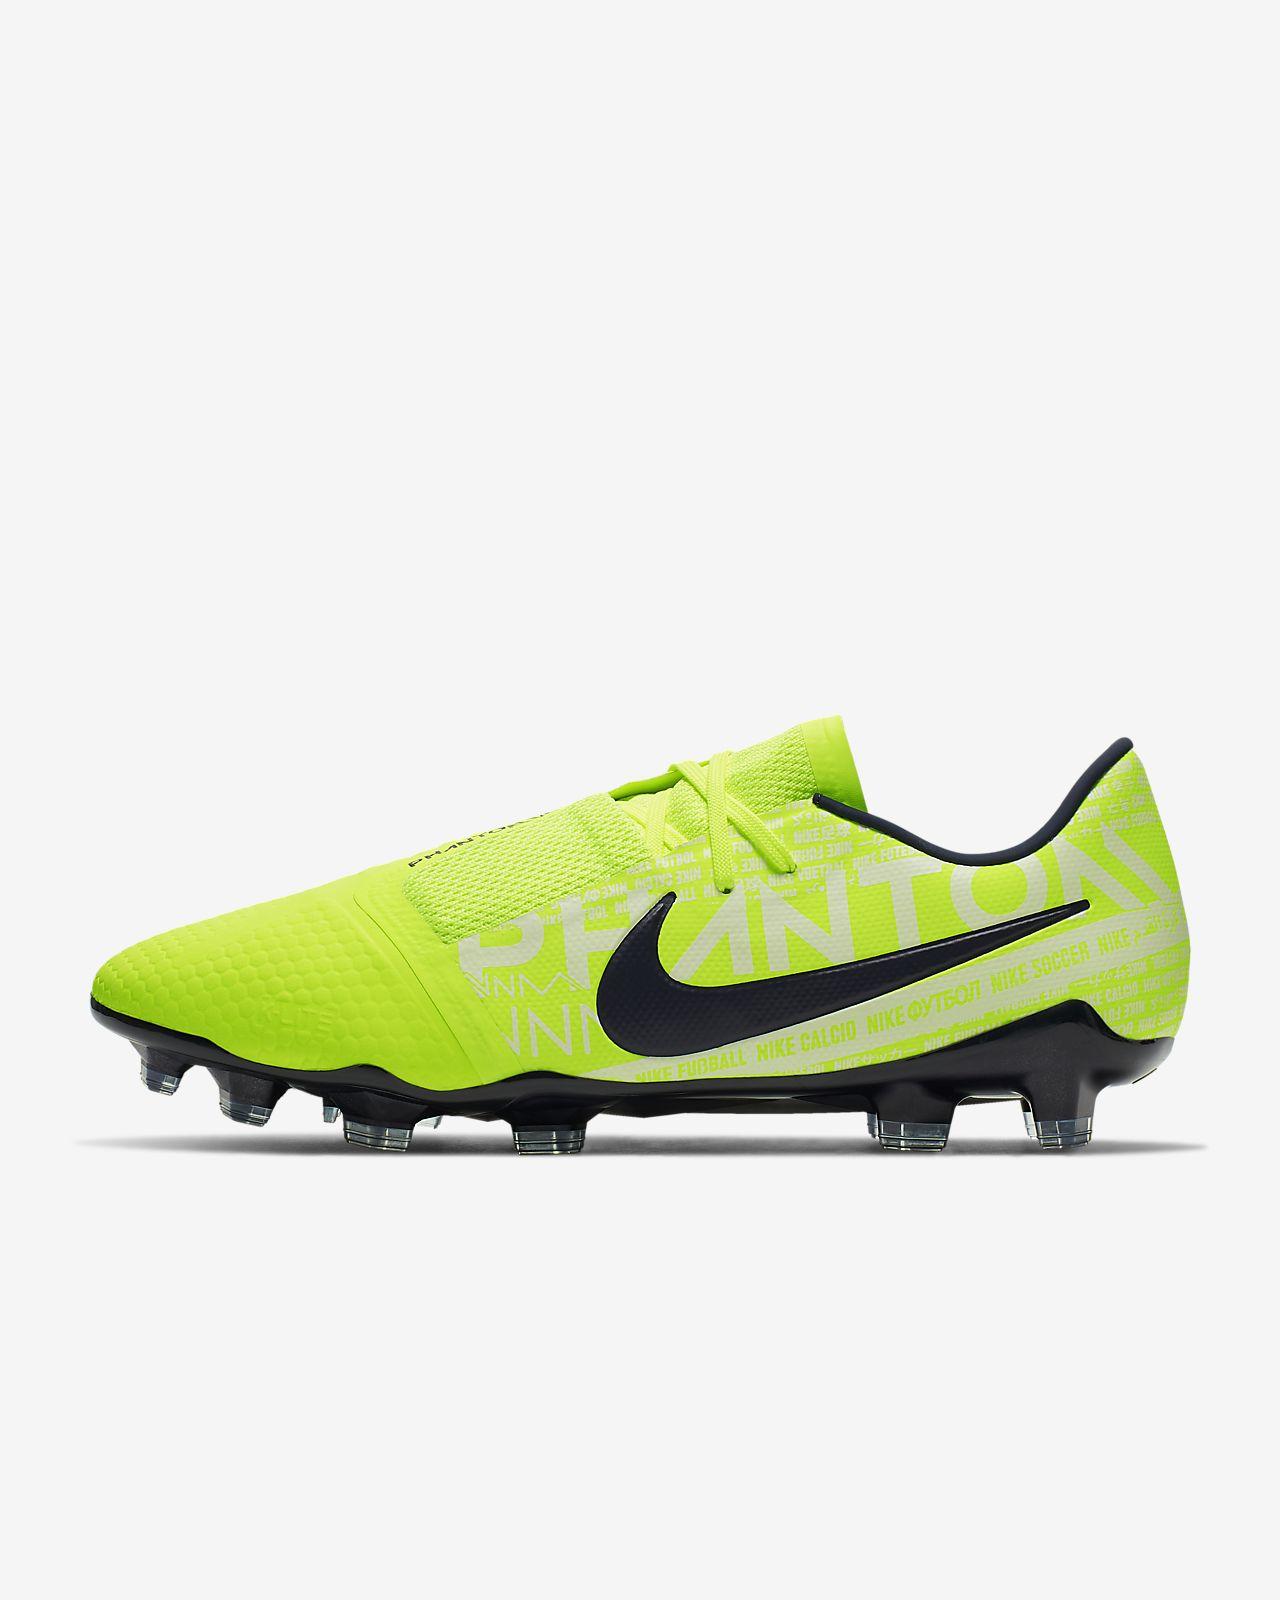 Nike Phantom Tf al miglior prezzo Trovaprezzi.it Scarpe da